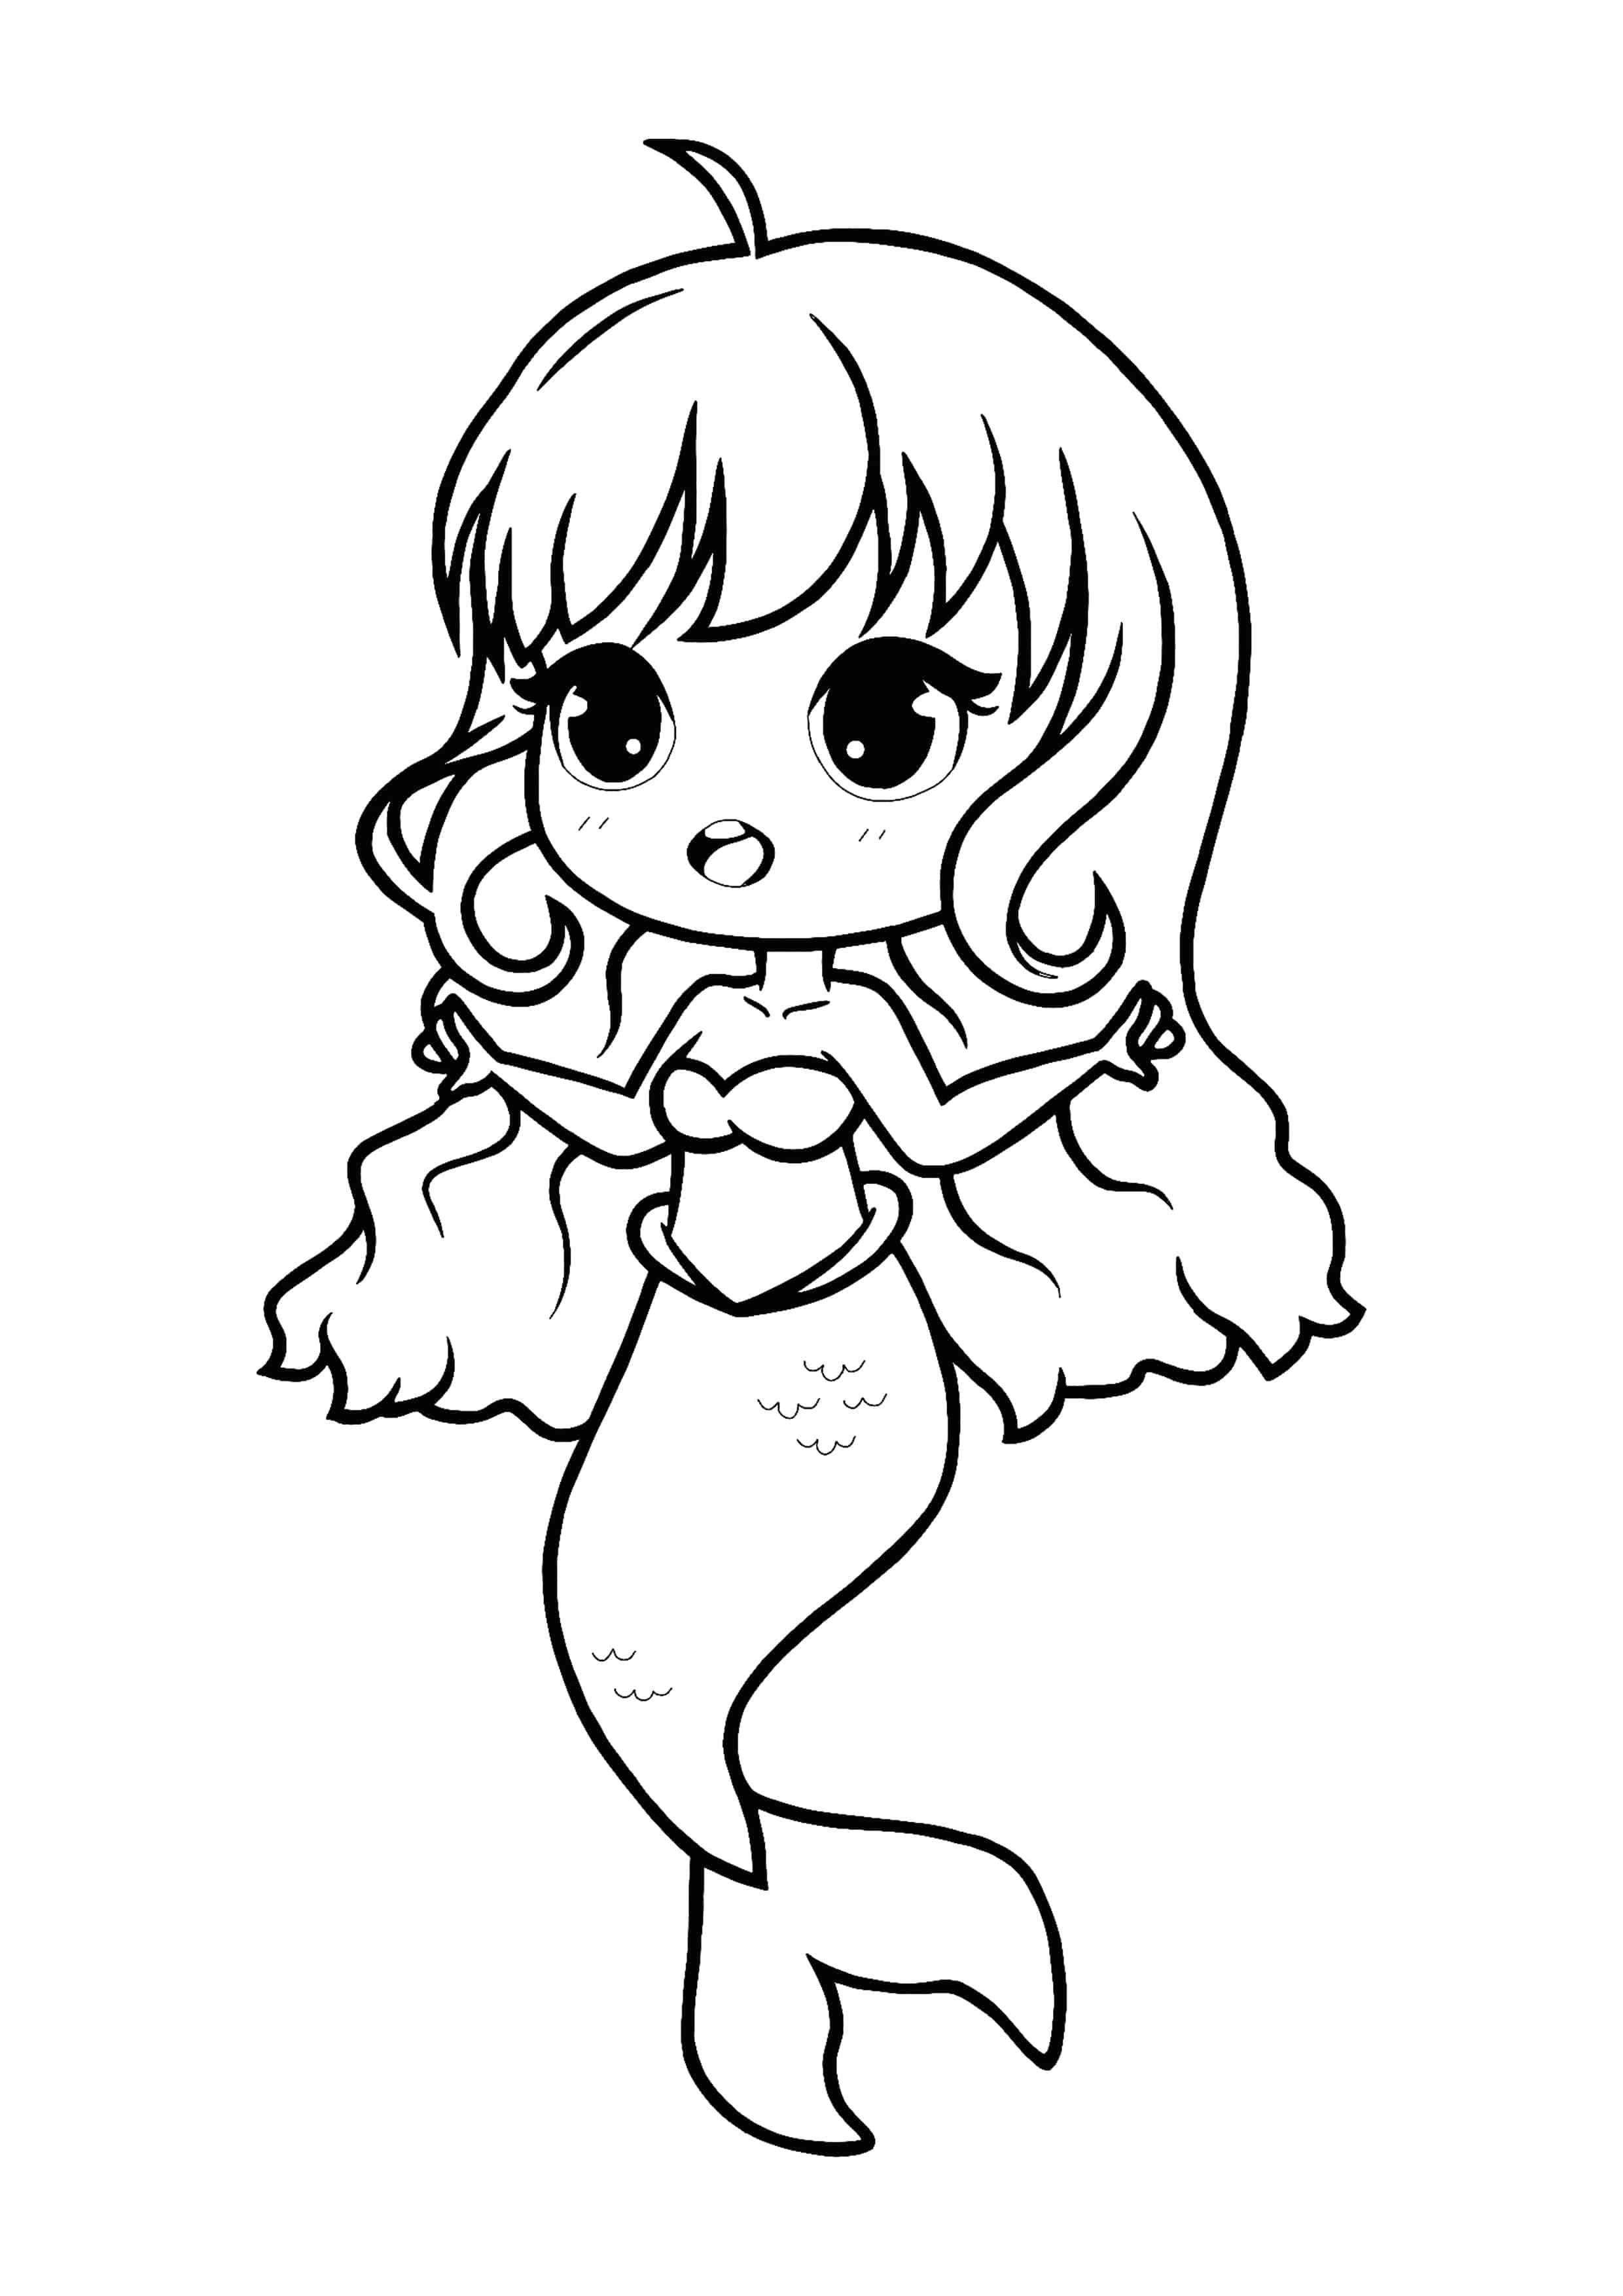 Kawaii Mermaid Coloring Page Mermaid Coloring Pages Cute Coloring Pages Mermaid Coloring